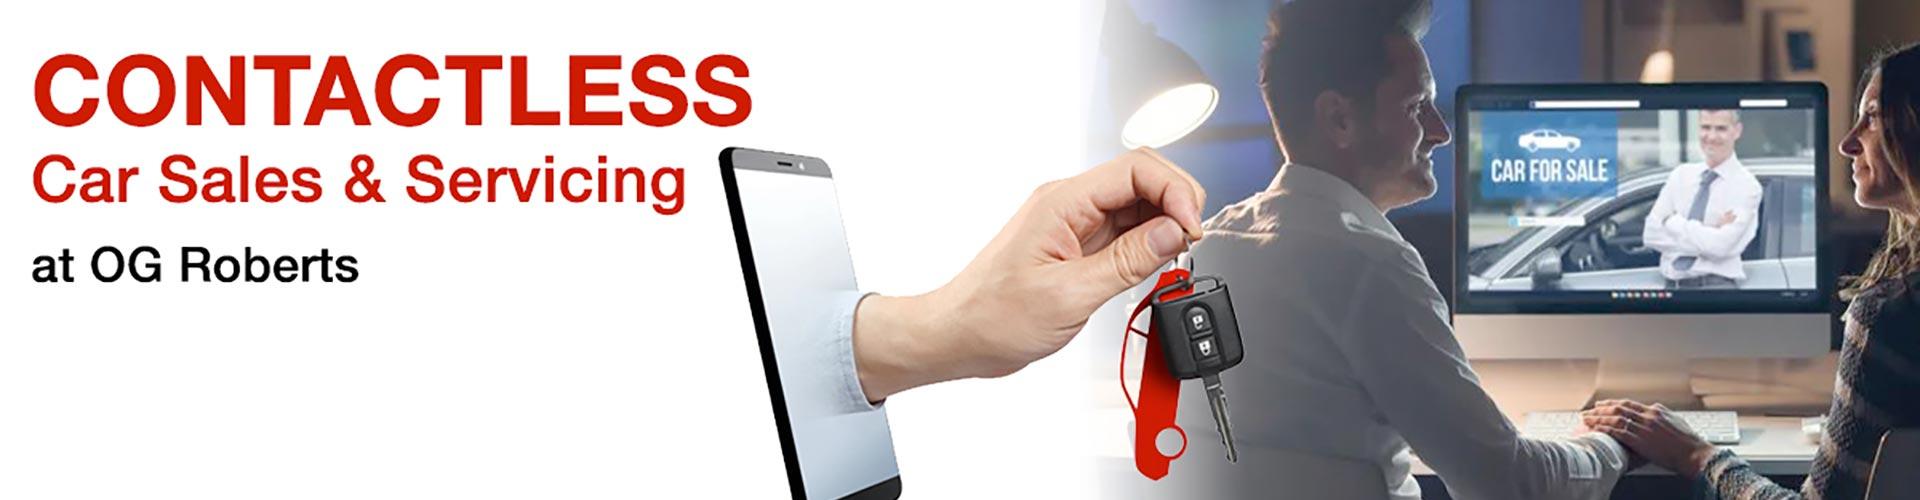 O G R Contactless Car Sales & Service